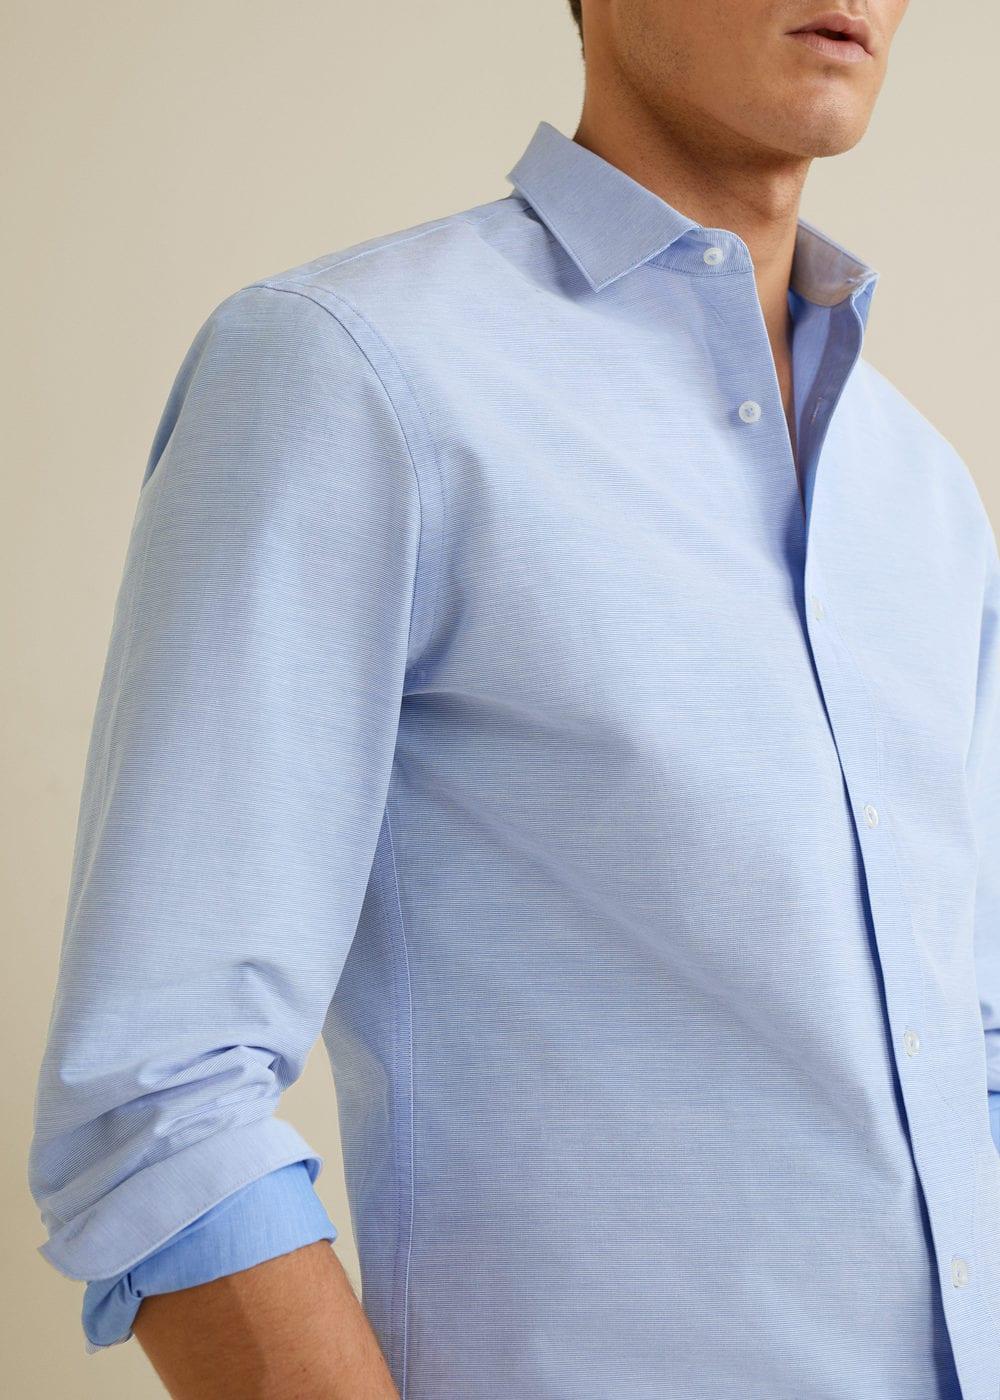 Mango - Camisa slim-fit estructura rayas - 5